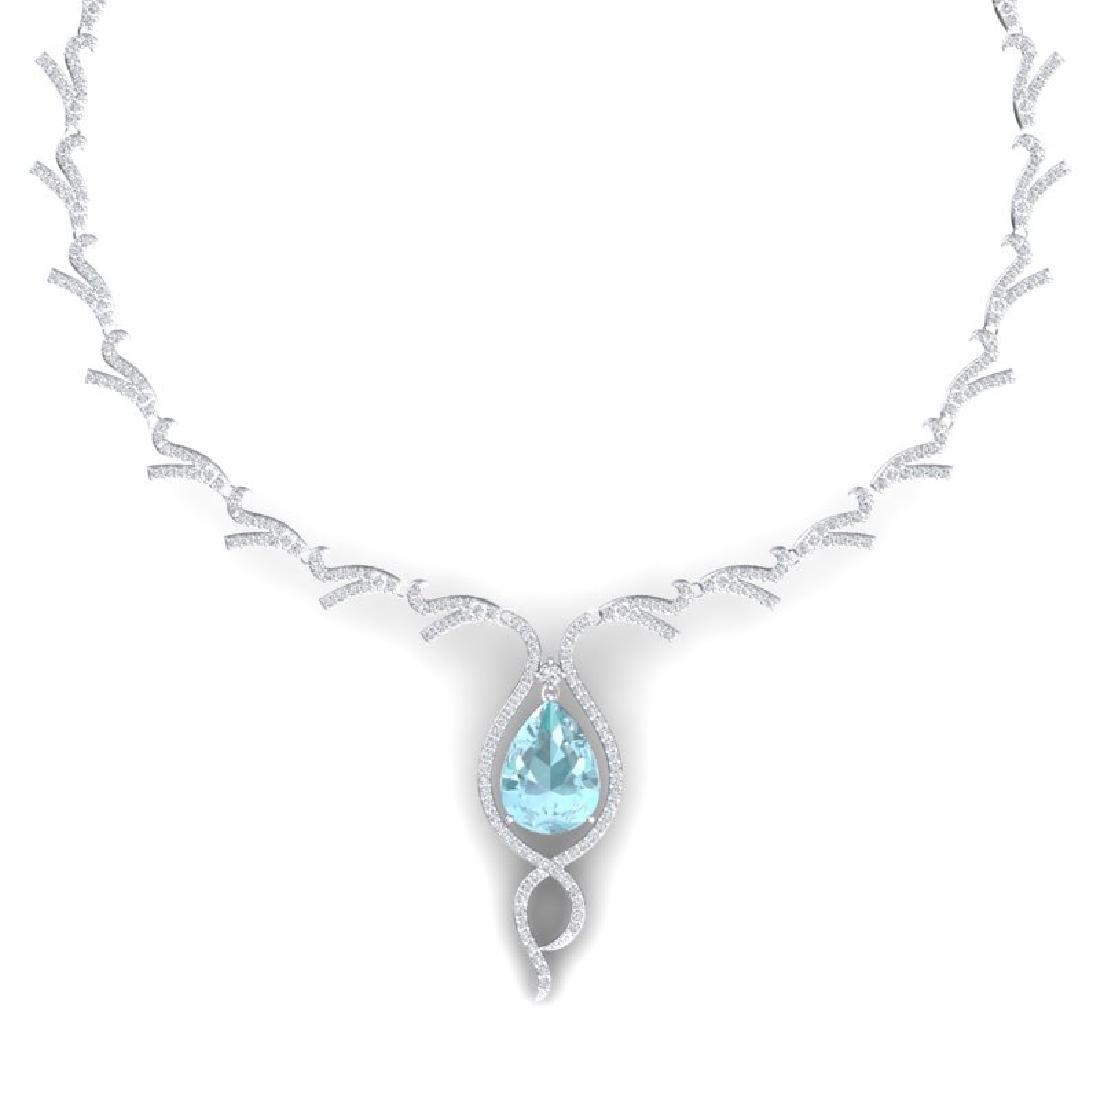 24.32 CTW Royalty Sky Topaz & VS Diamond Necklace 18K